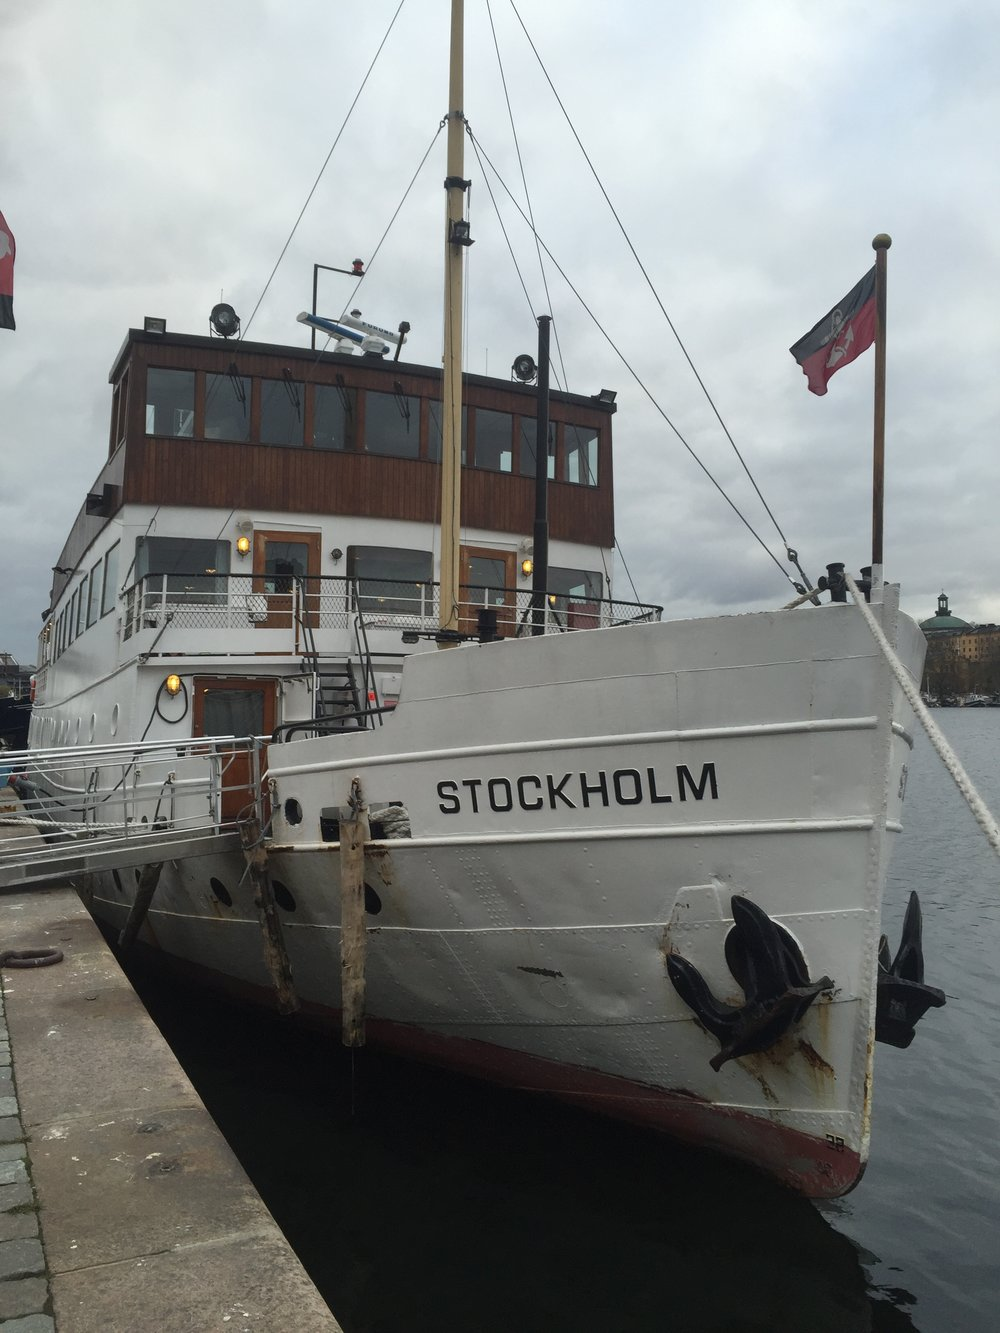 Stockholm Boats    photo by L.D. Van Cleave